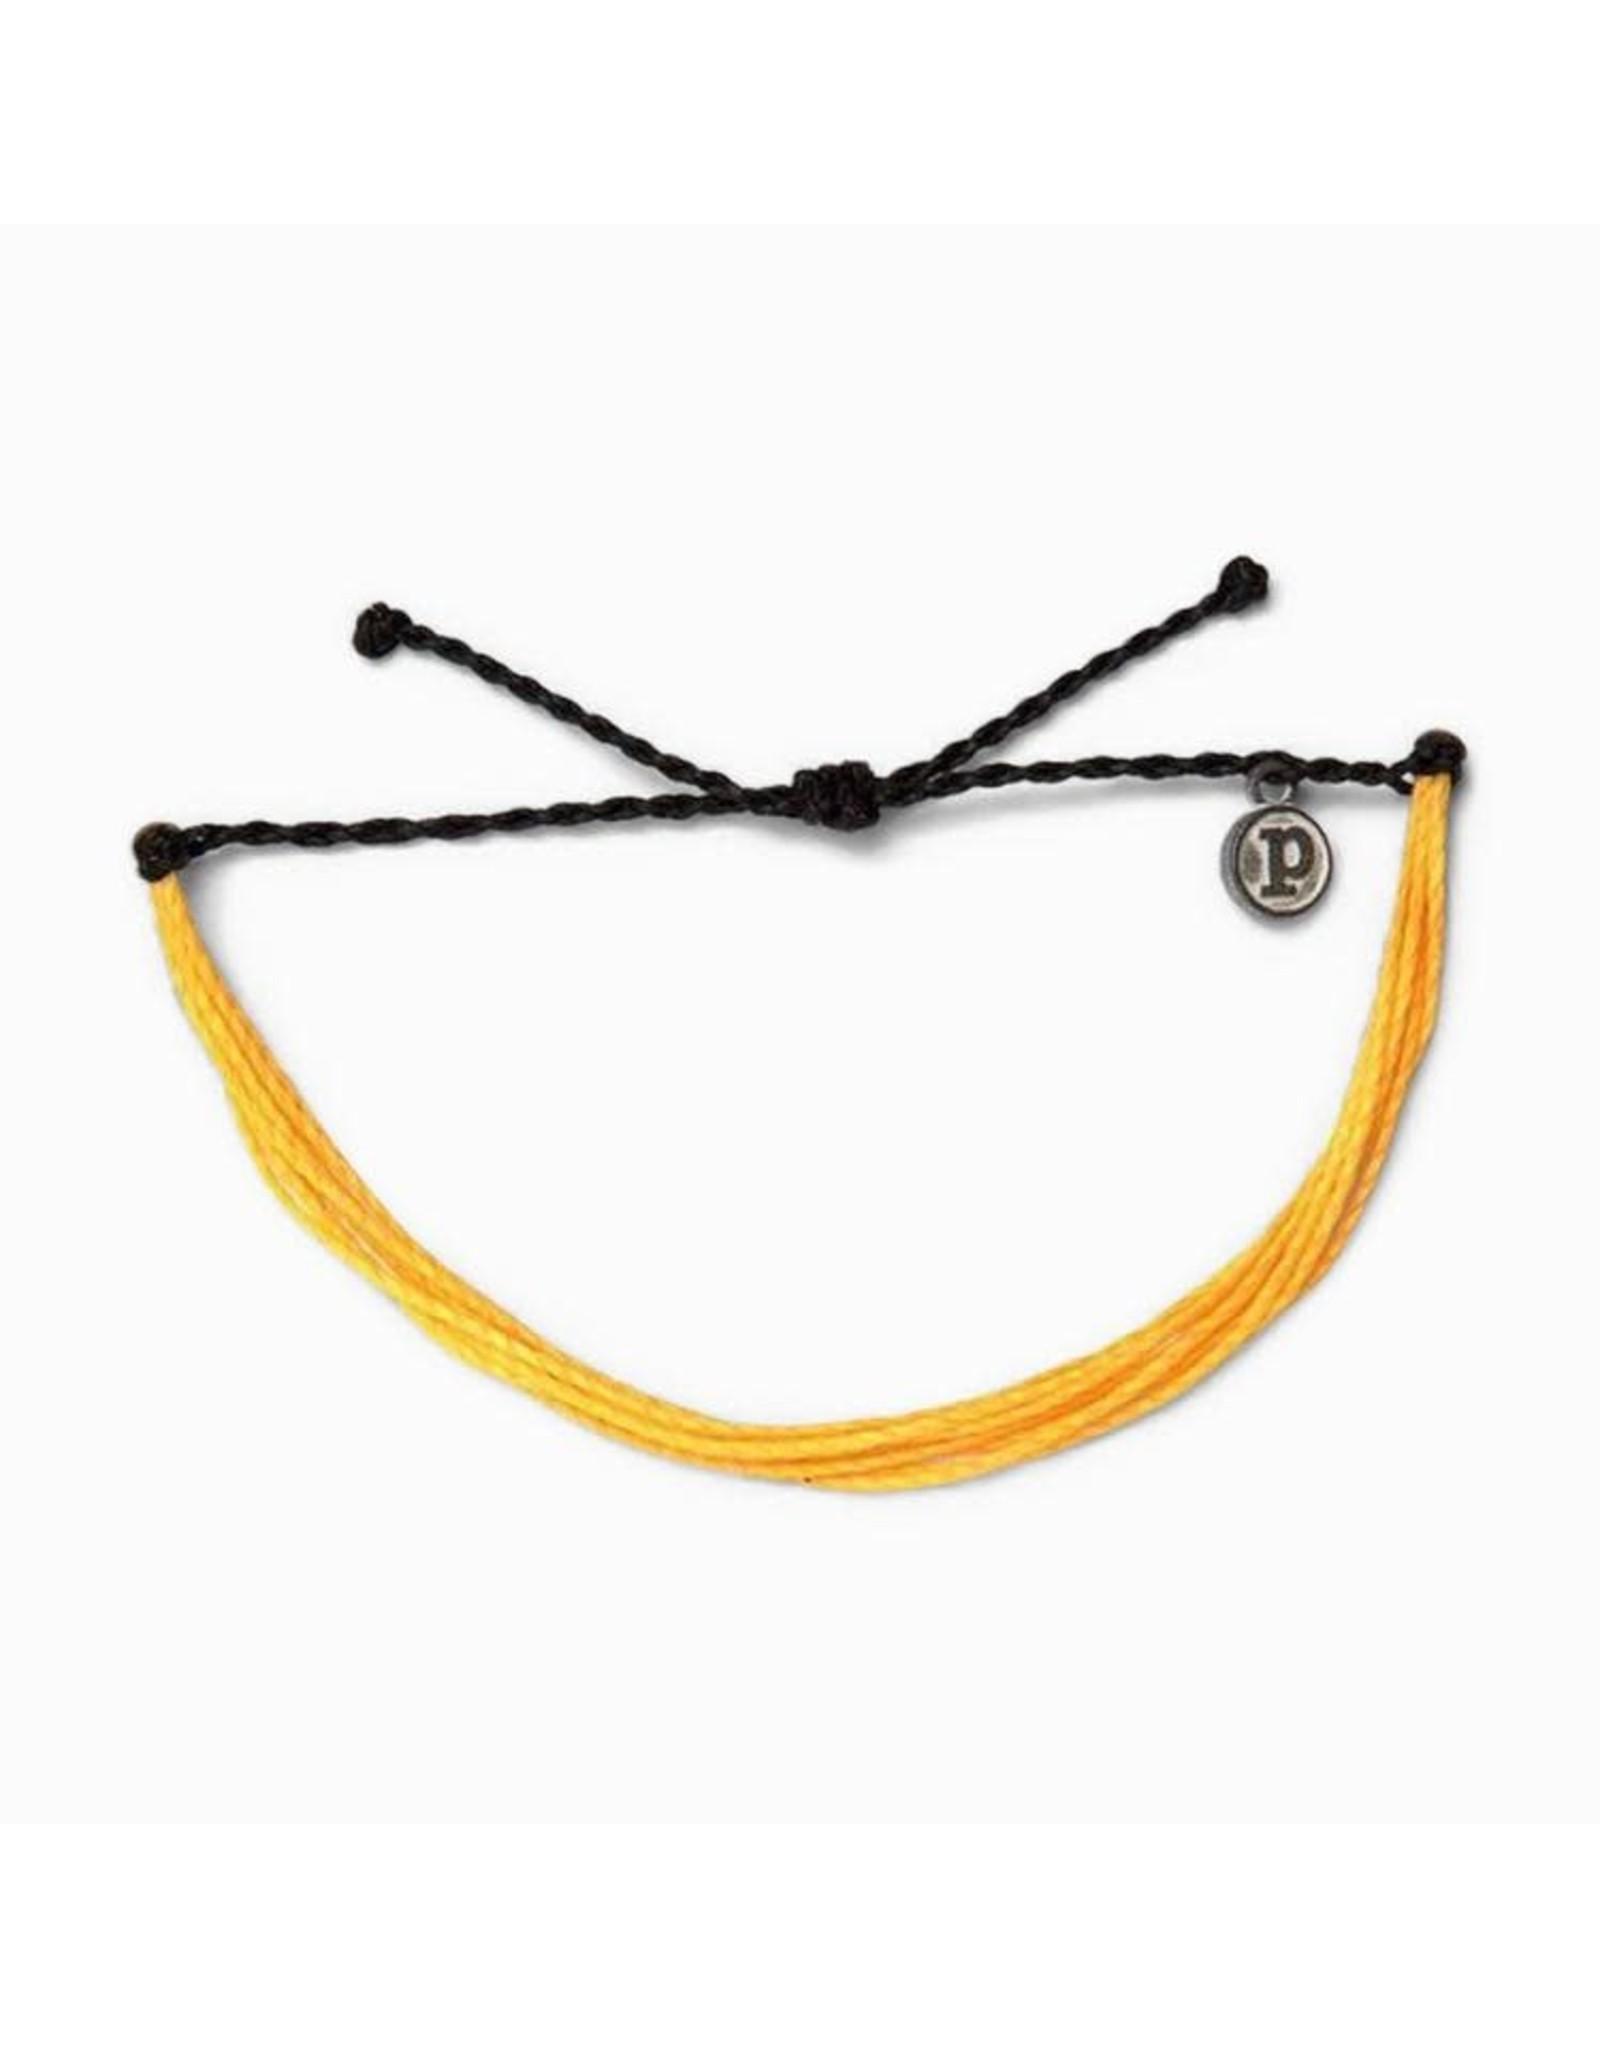 Puravida Bracelet Charity Original Suicide Prevention